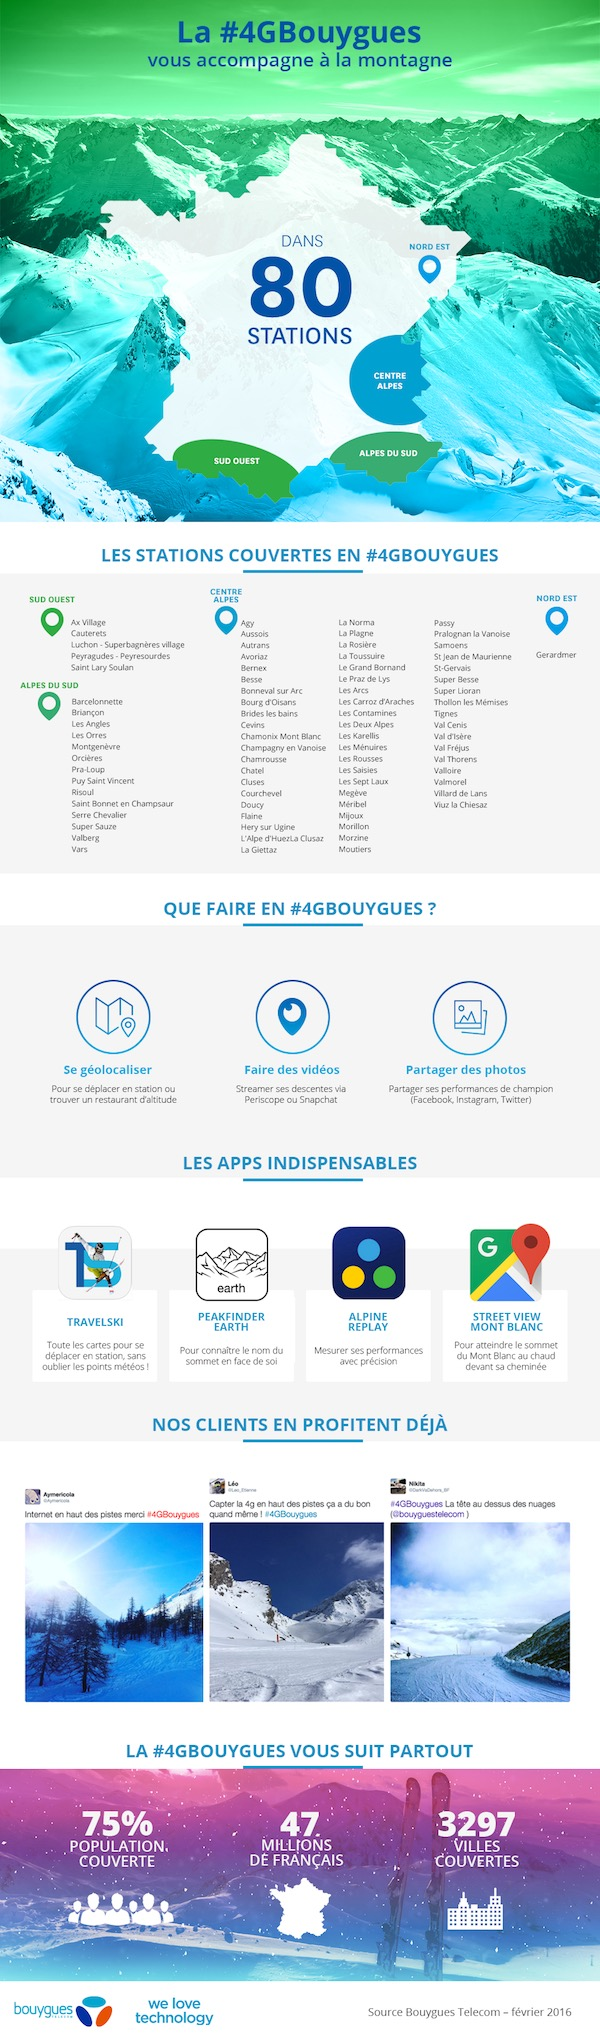 Bouygues Telecom - 4G Ski 2016